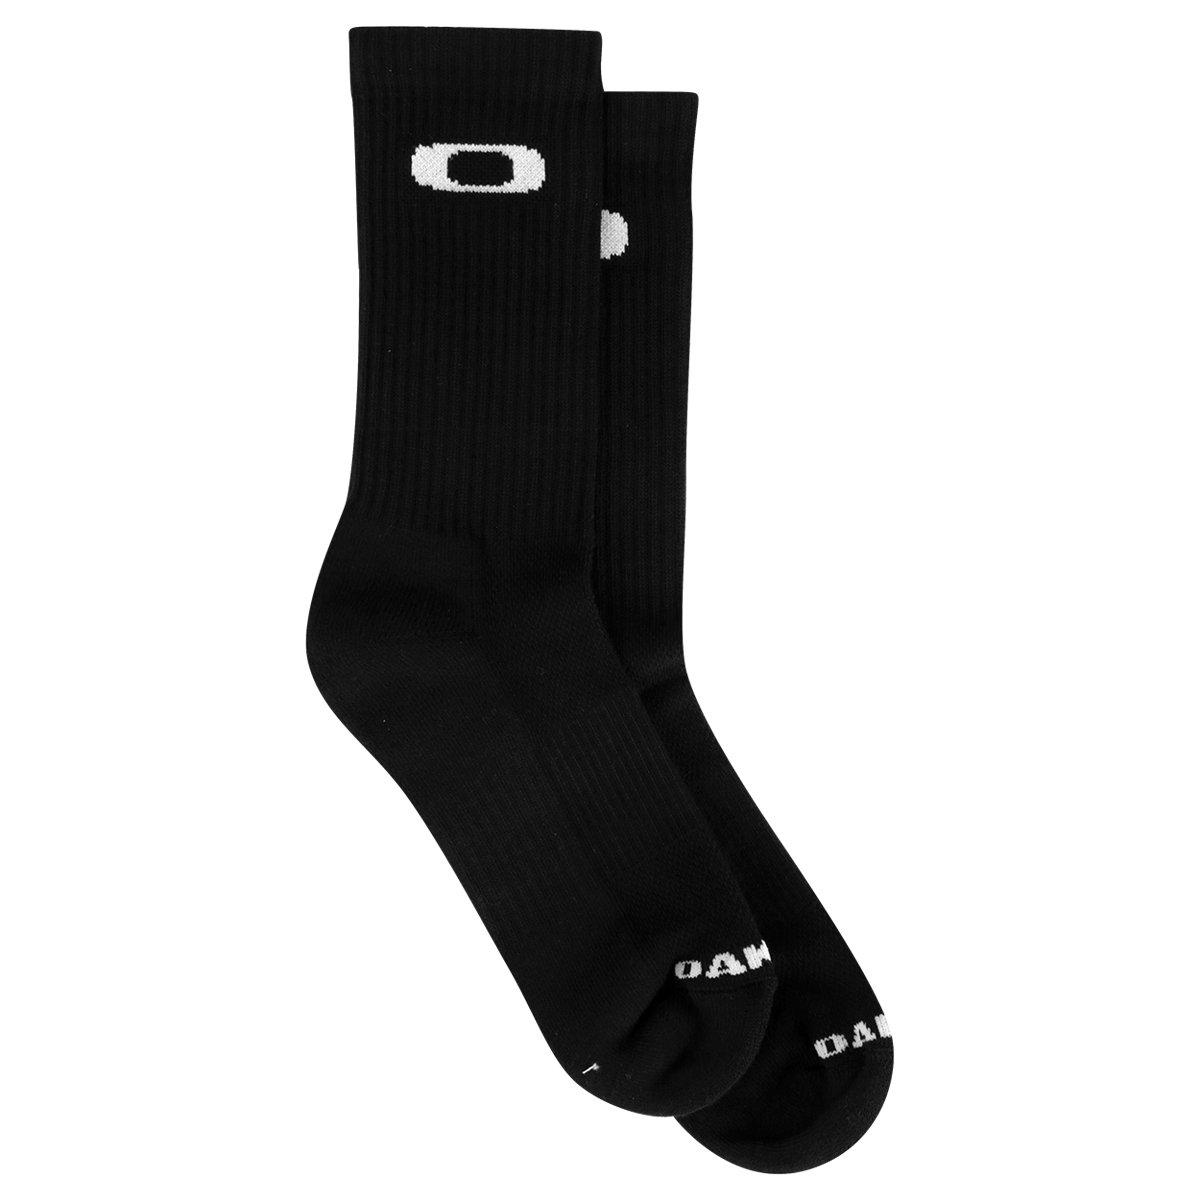 Meia Oakley Cano Alto Mod Crew Sock 2.0 Masculina - Compre Agora ... 7cac796848e